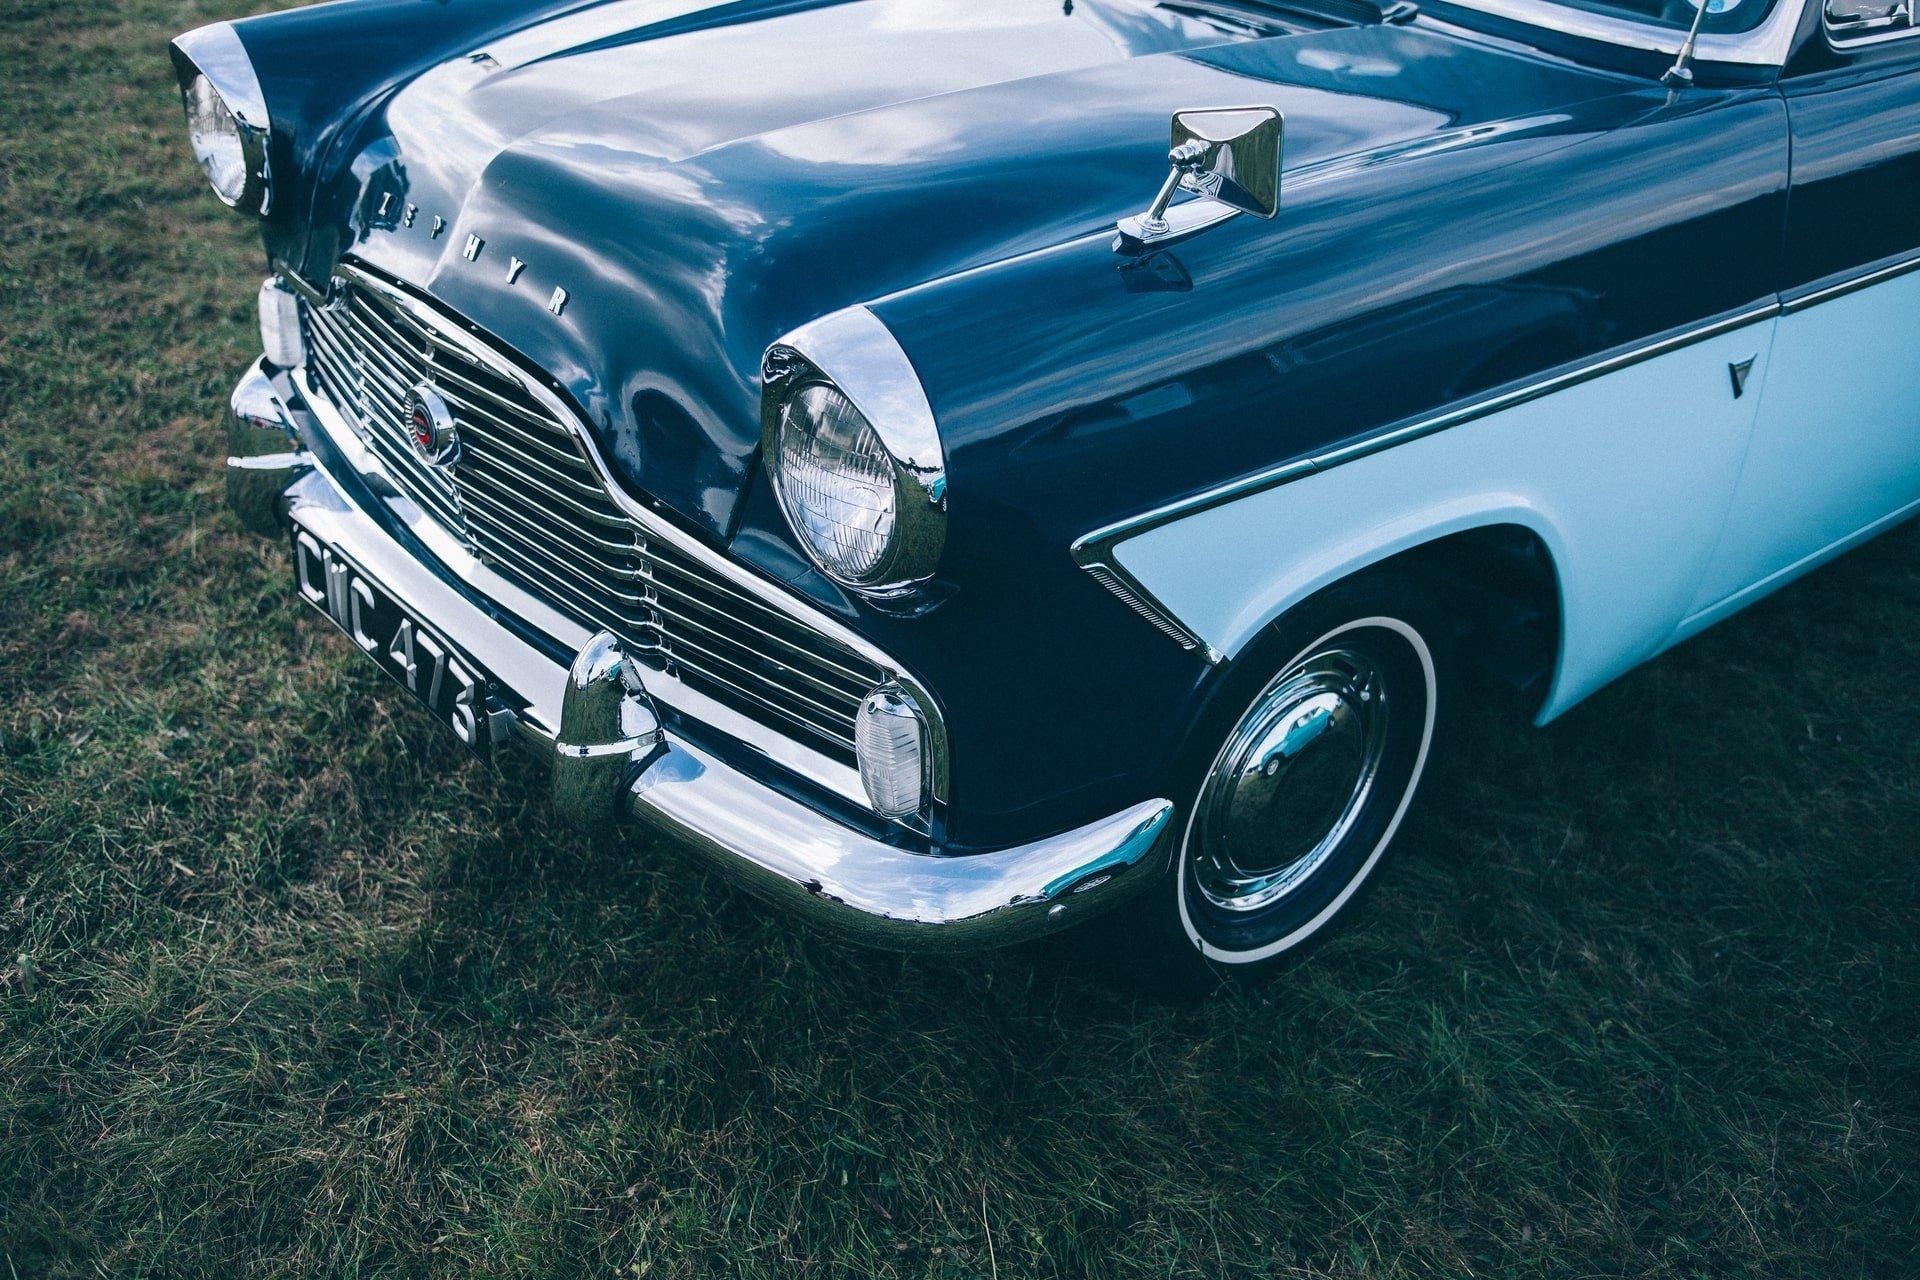 blue-marine-white-classic-car